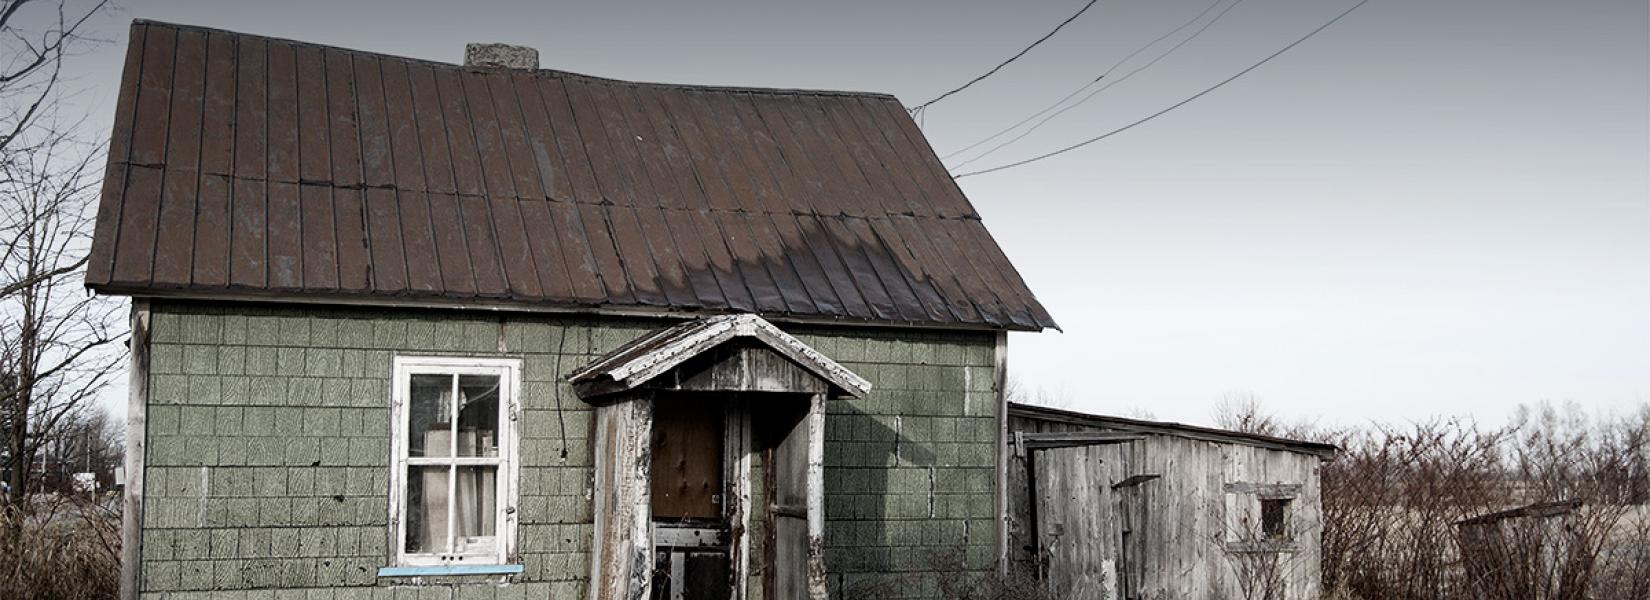 Maisons abandonnes en Montrgie  Urbex playground